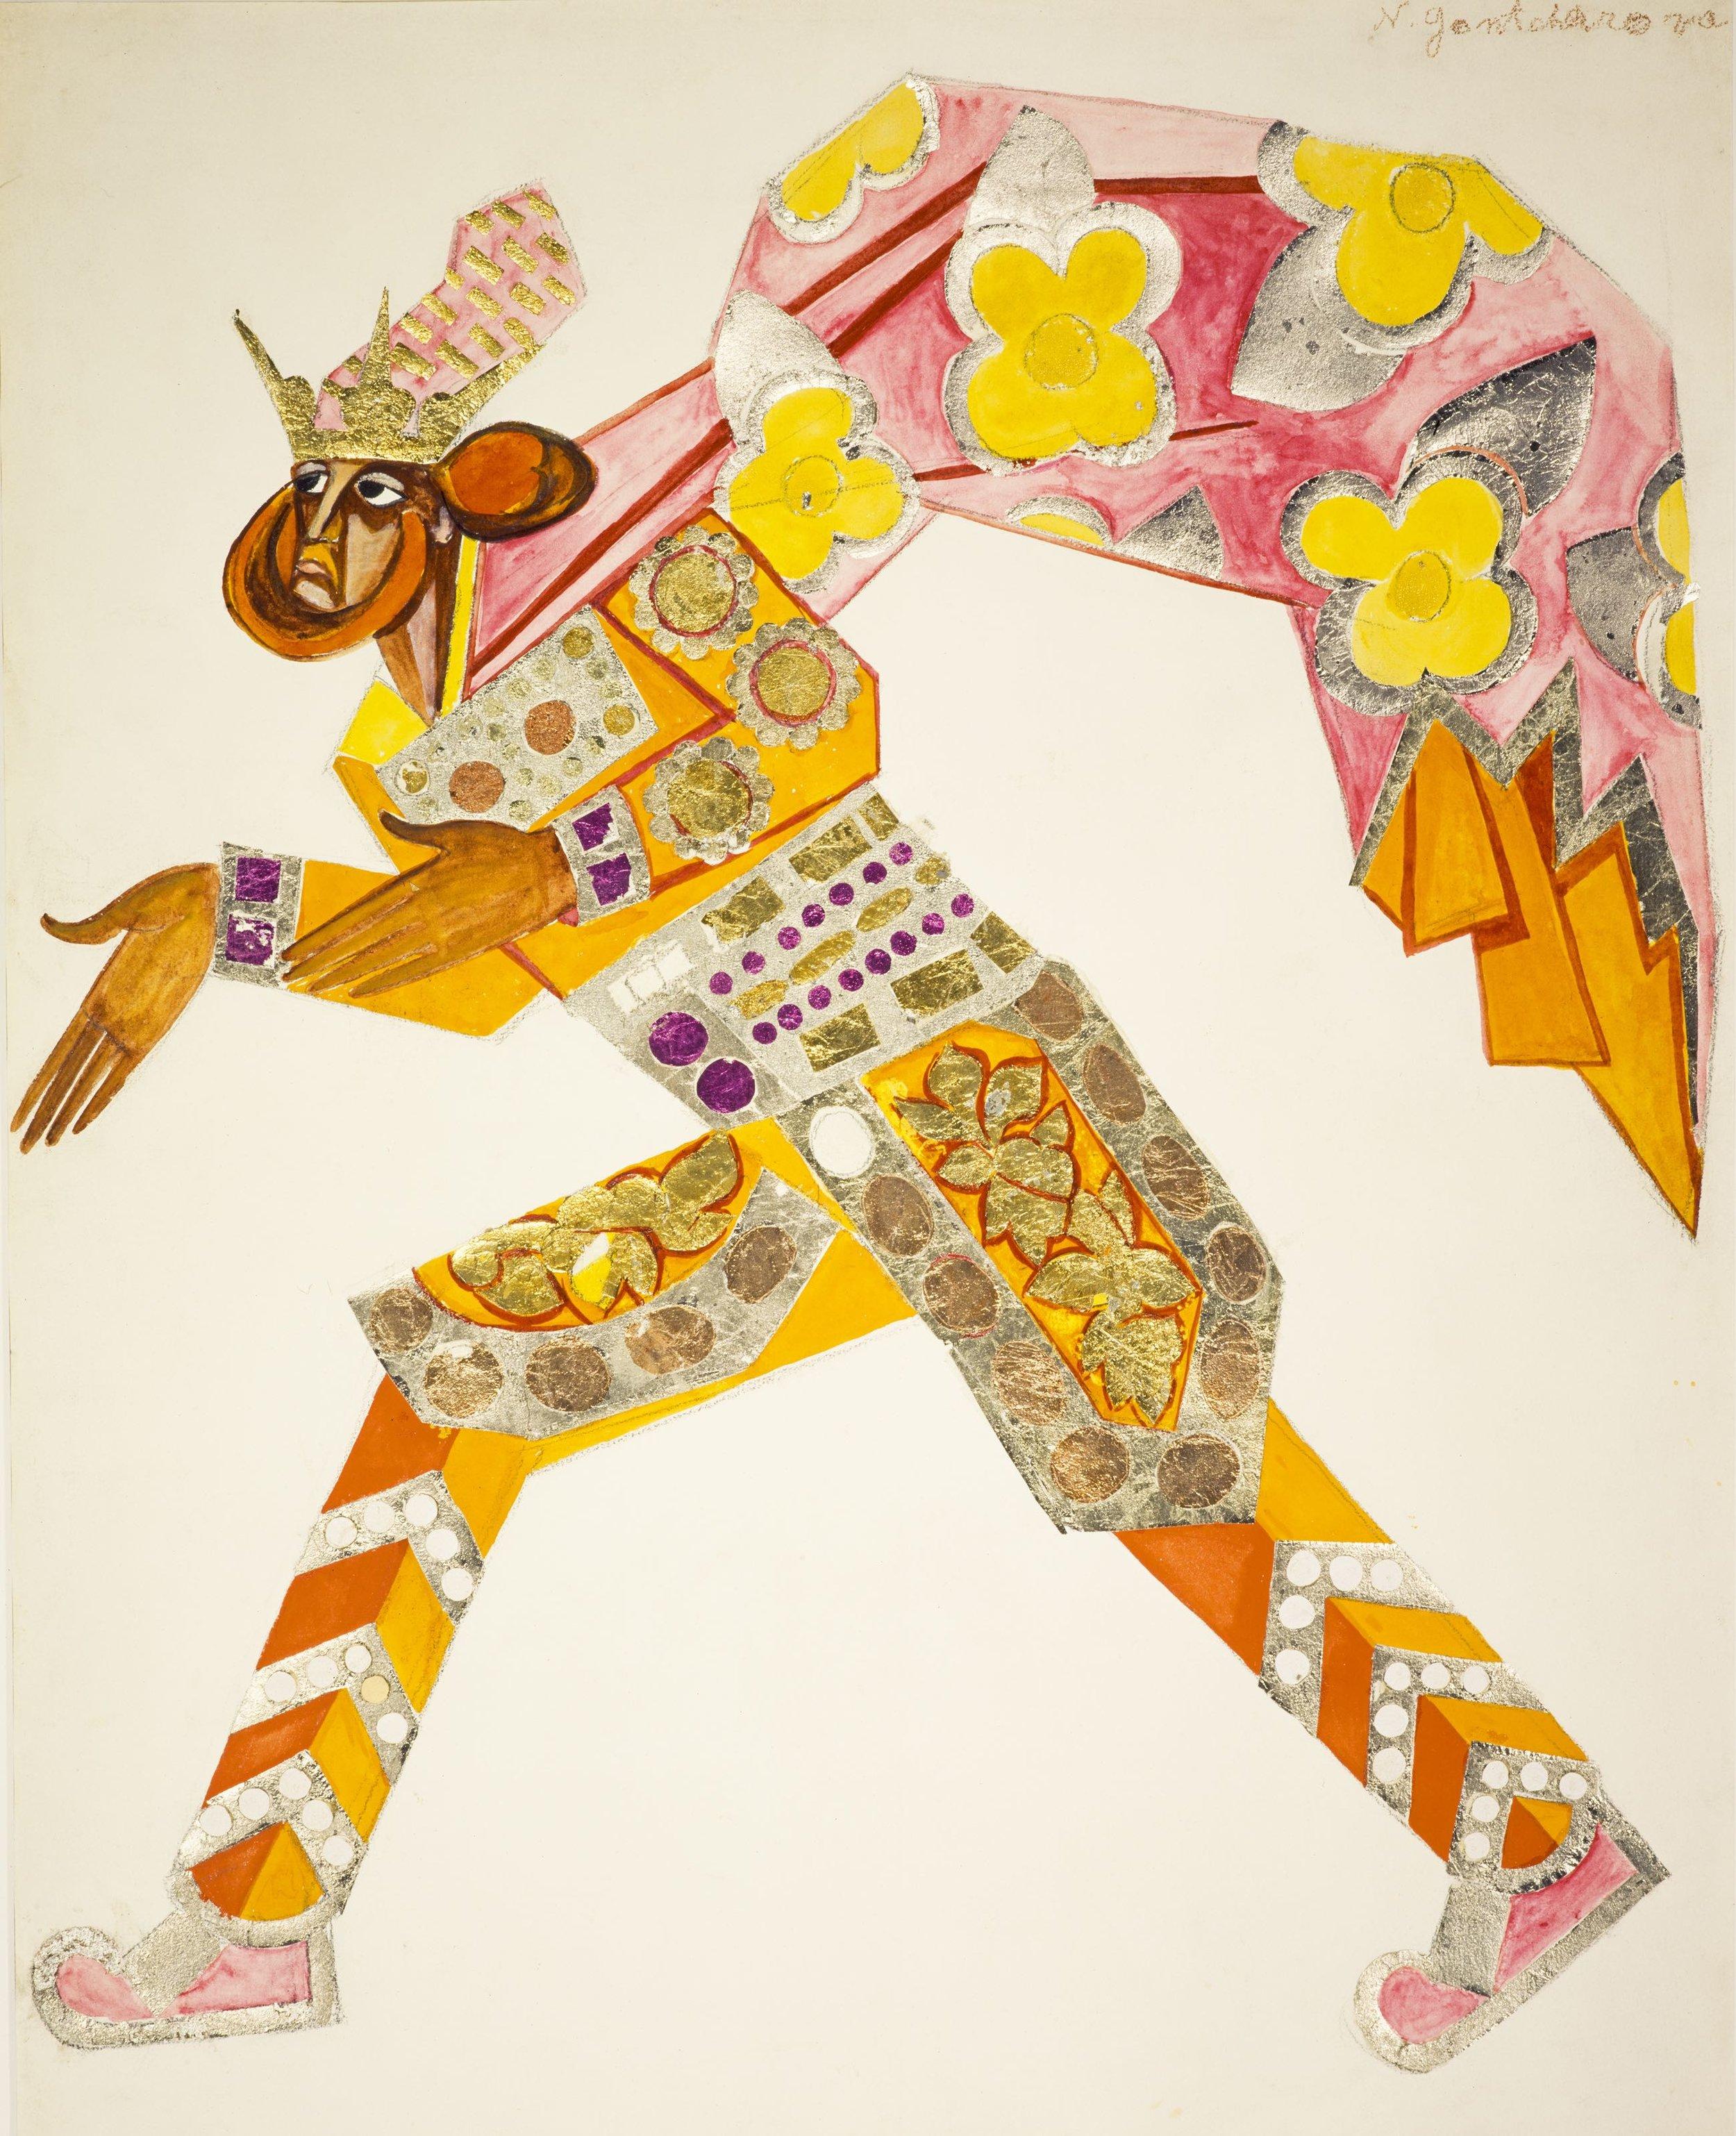 Natalya Goncharova, Costume Design for One of the Three Kings in 'La Liturgie' (1915)